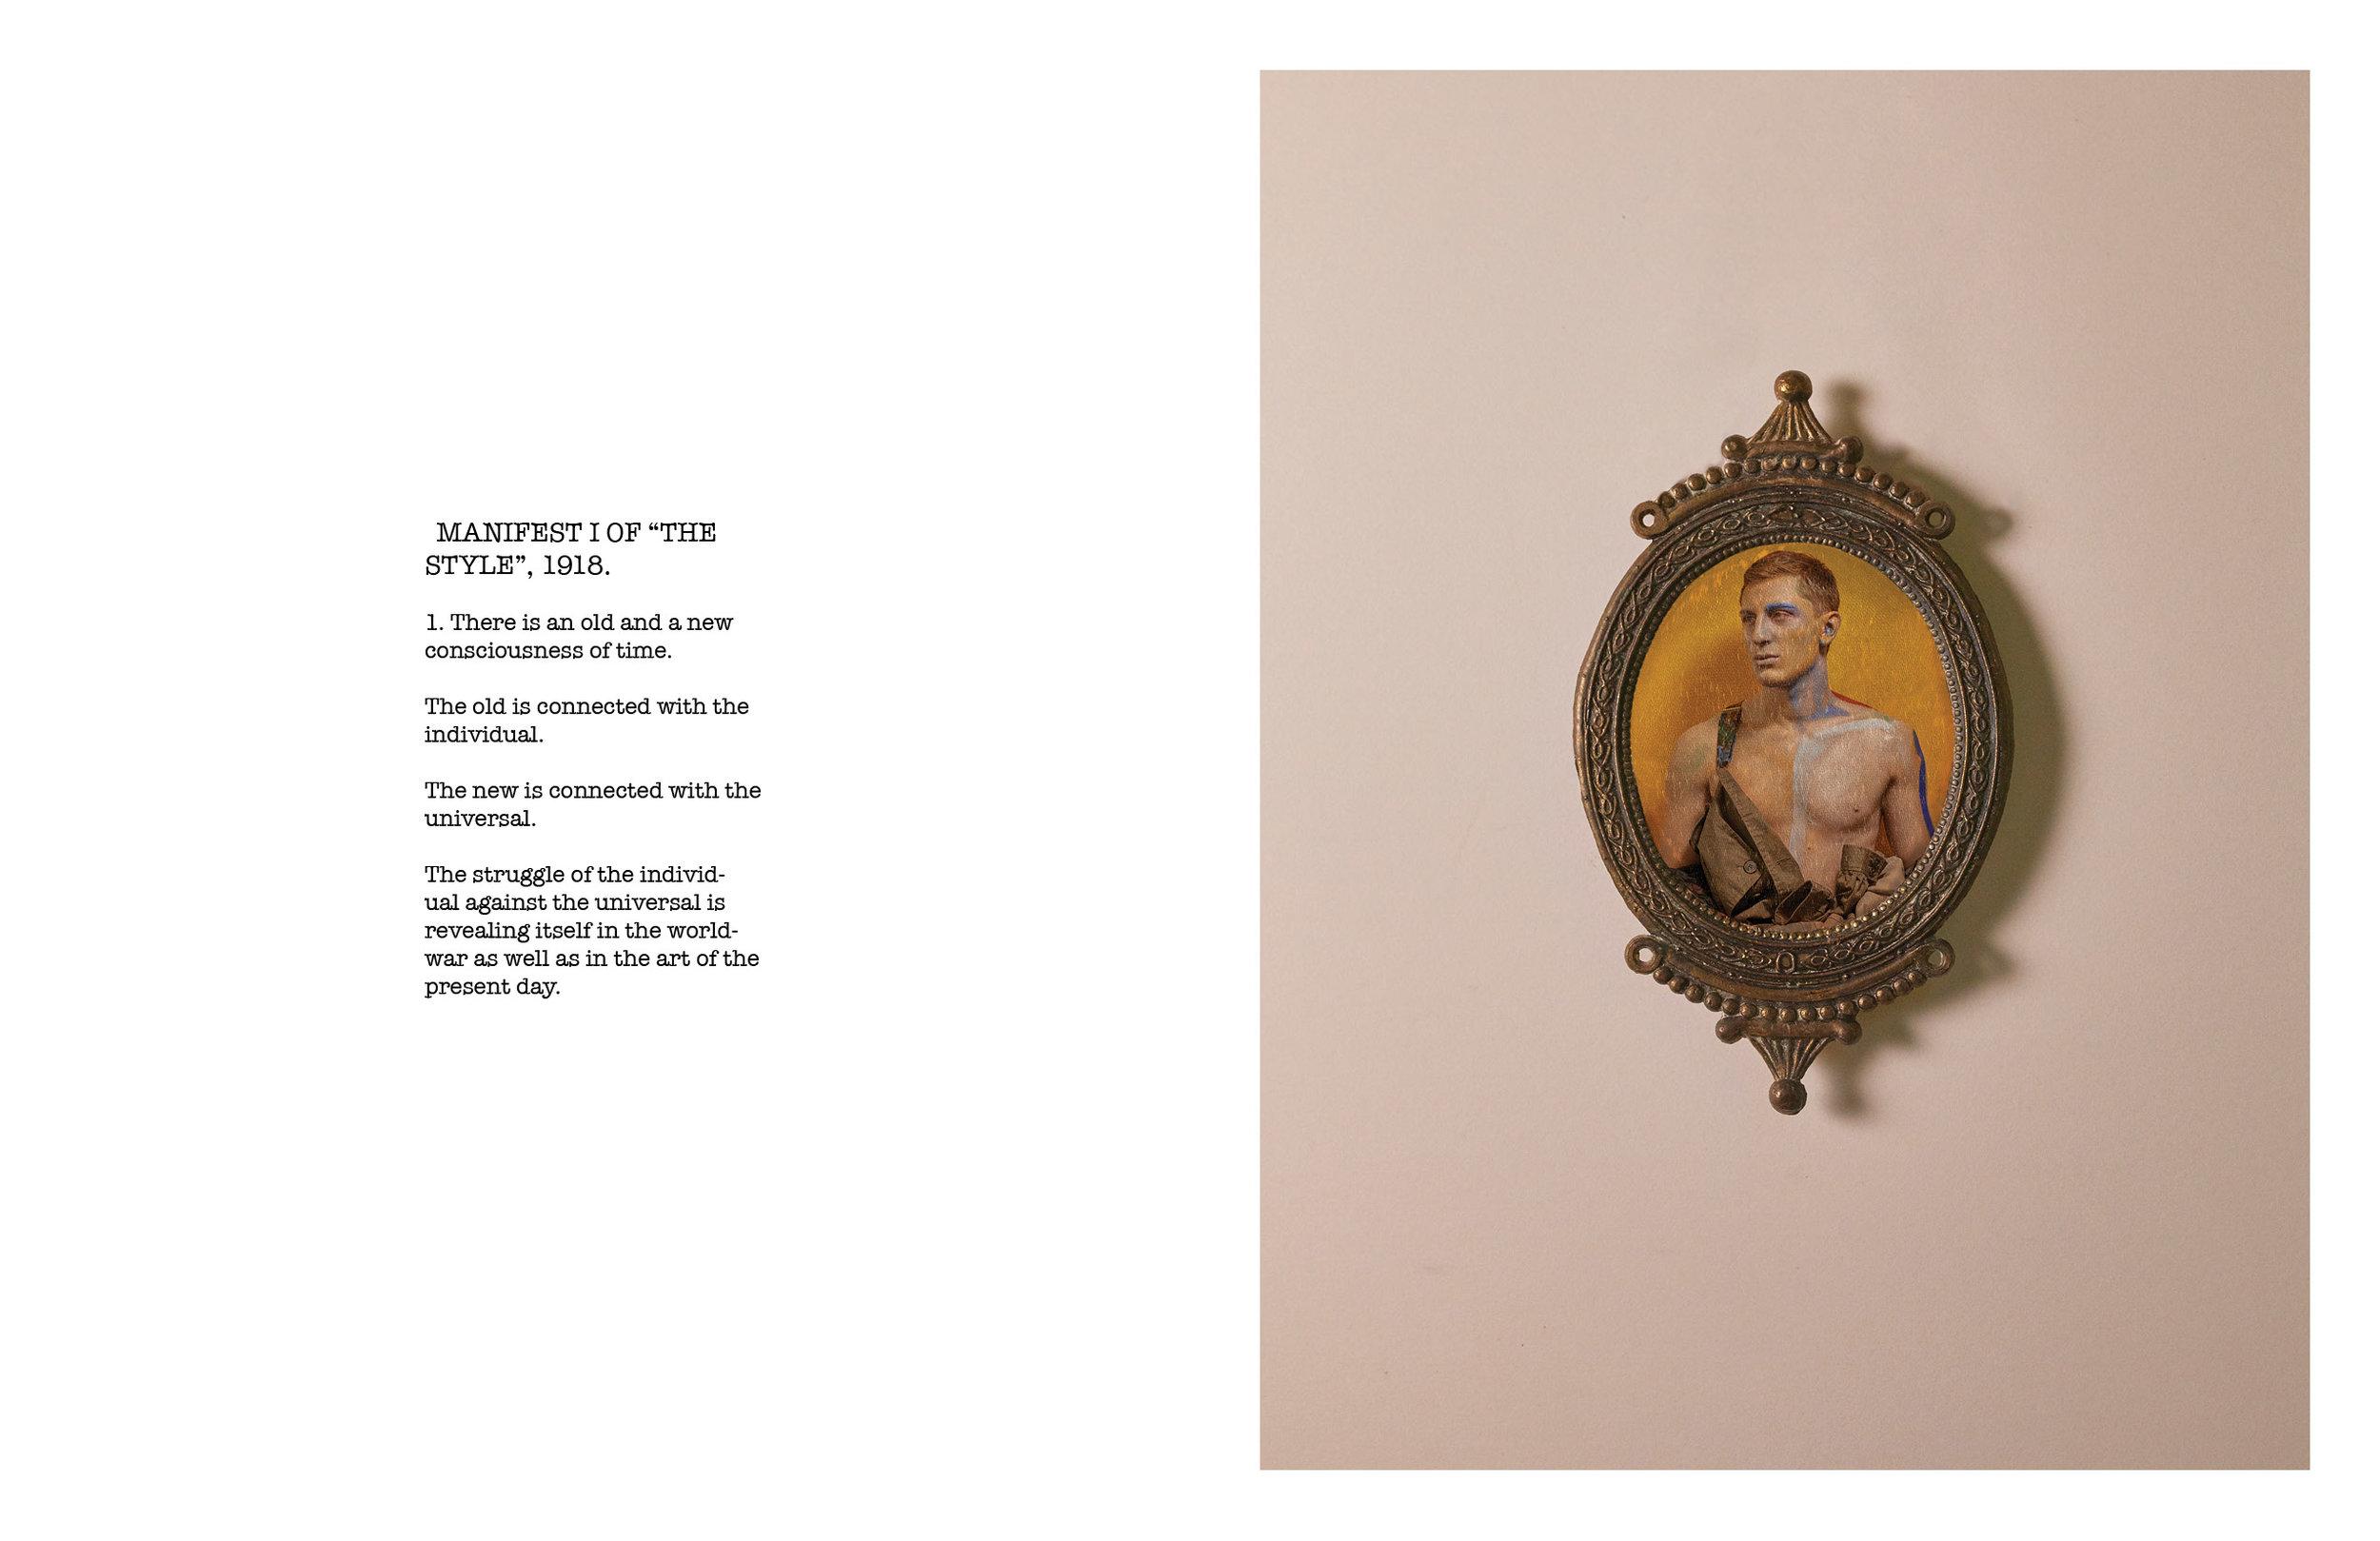 IndividualVSUniversal-Art of Looking6.jpg